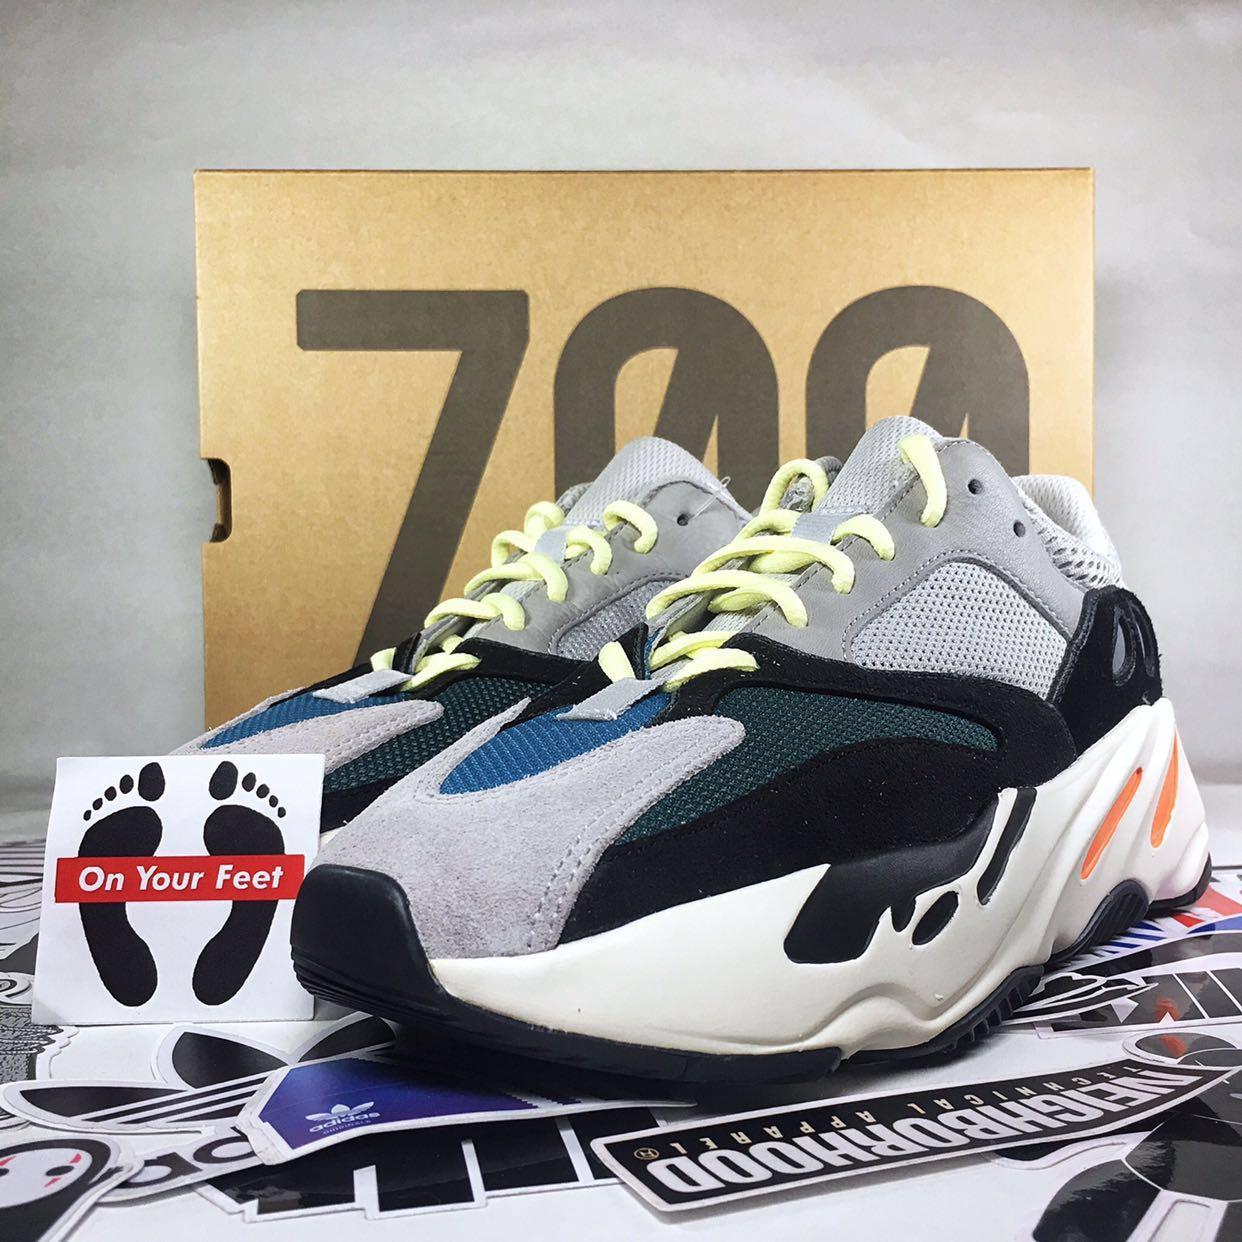 941c24ac23b7d SELLING  Adidas Yeezy Boost 700 V1 OG  Waverunners